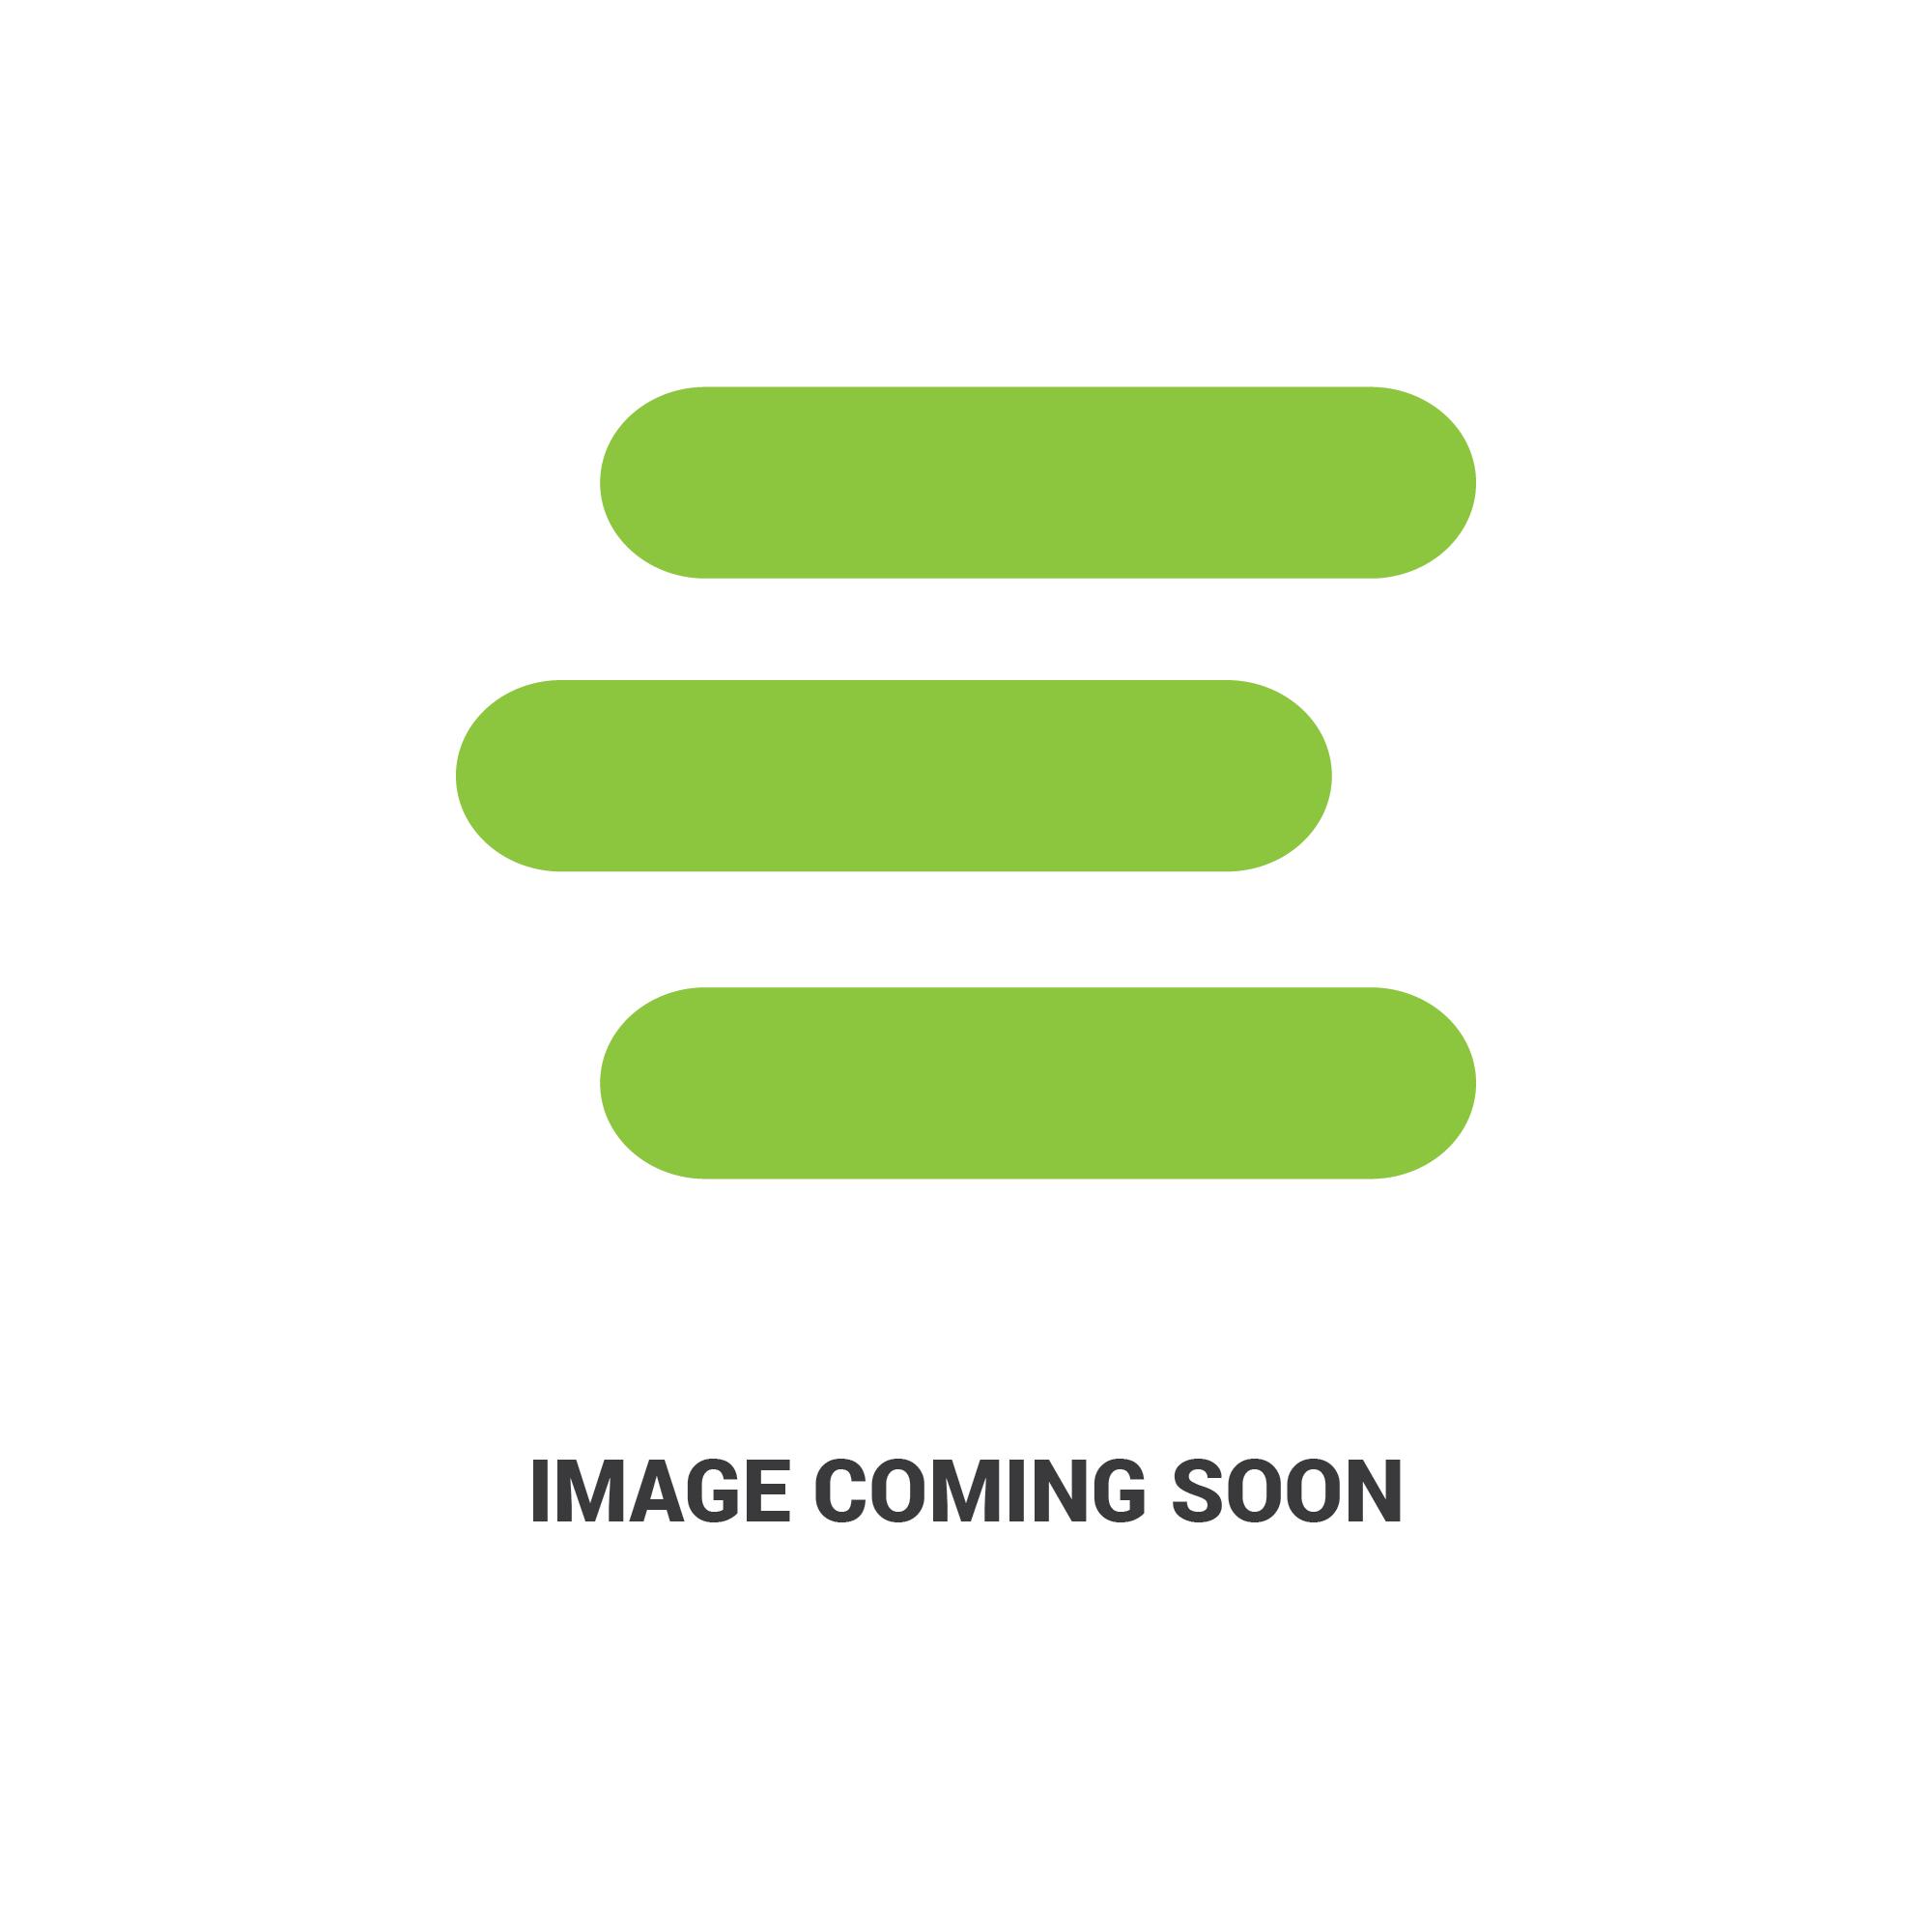 E-15221-12430edit 1.jpg